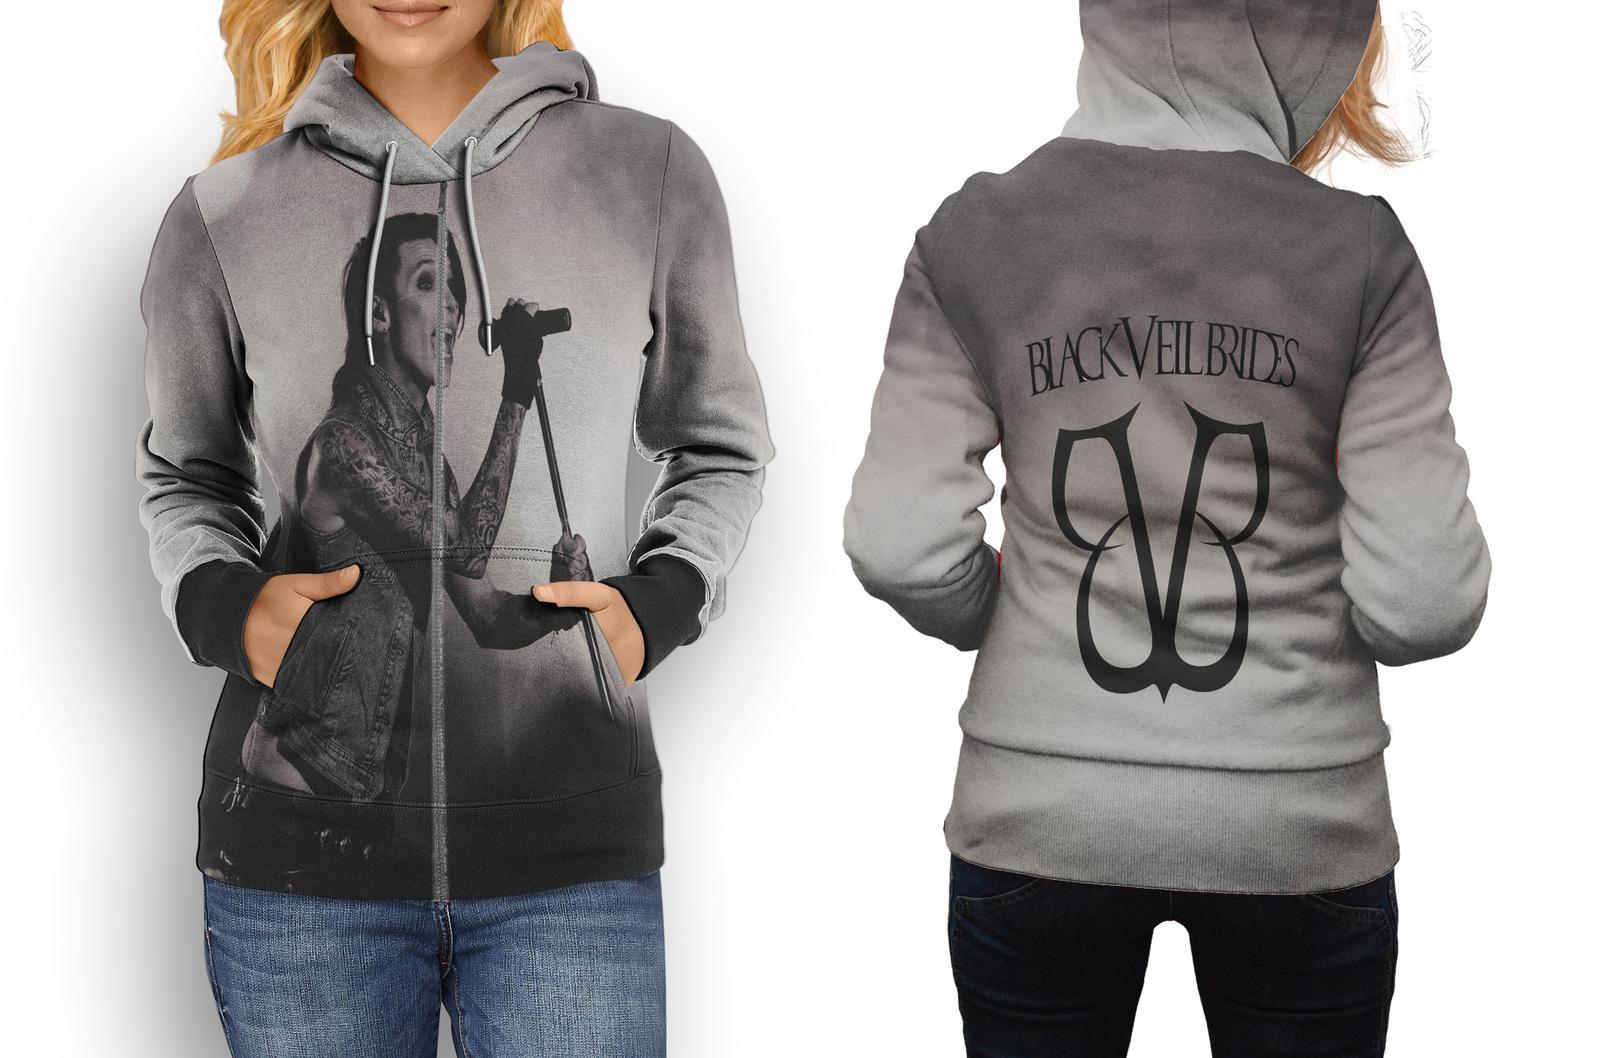 Black Veil Brides Collection #1 Women's Zipper Hoodie - $49.80 - $59.80